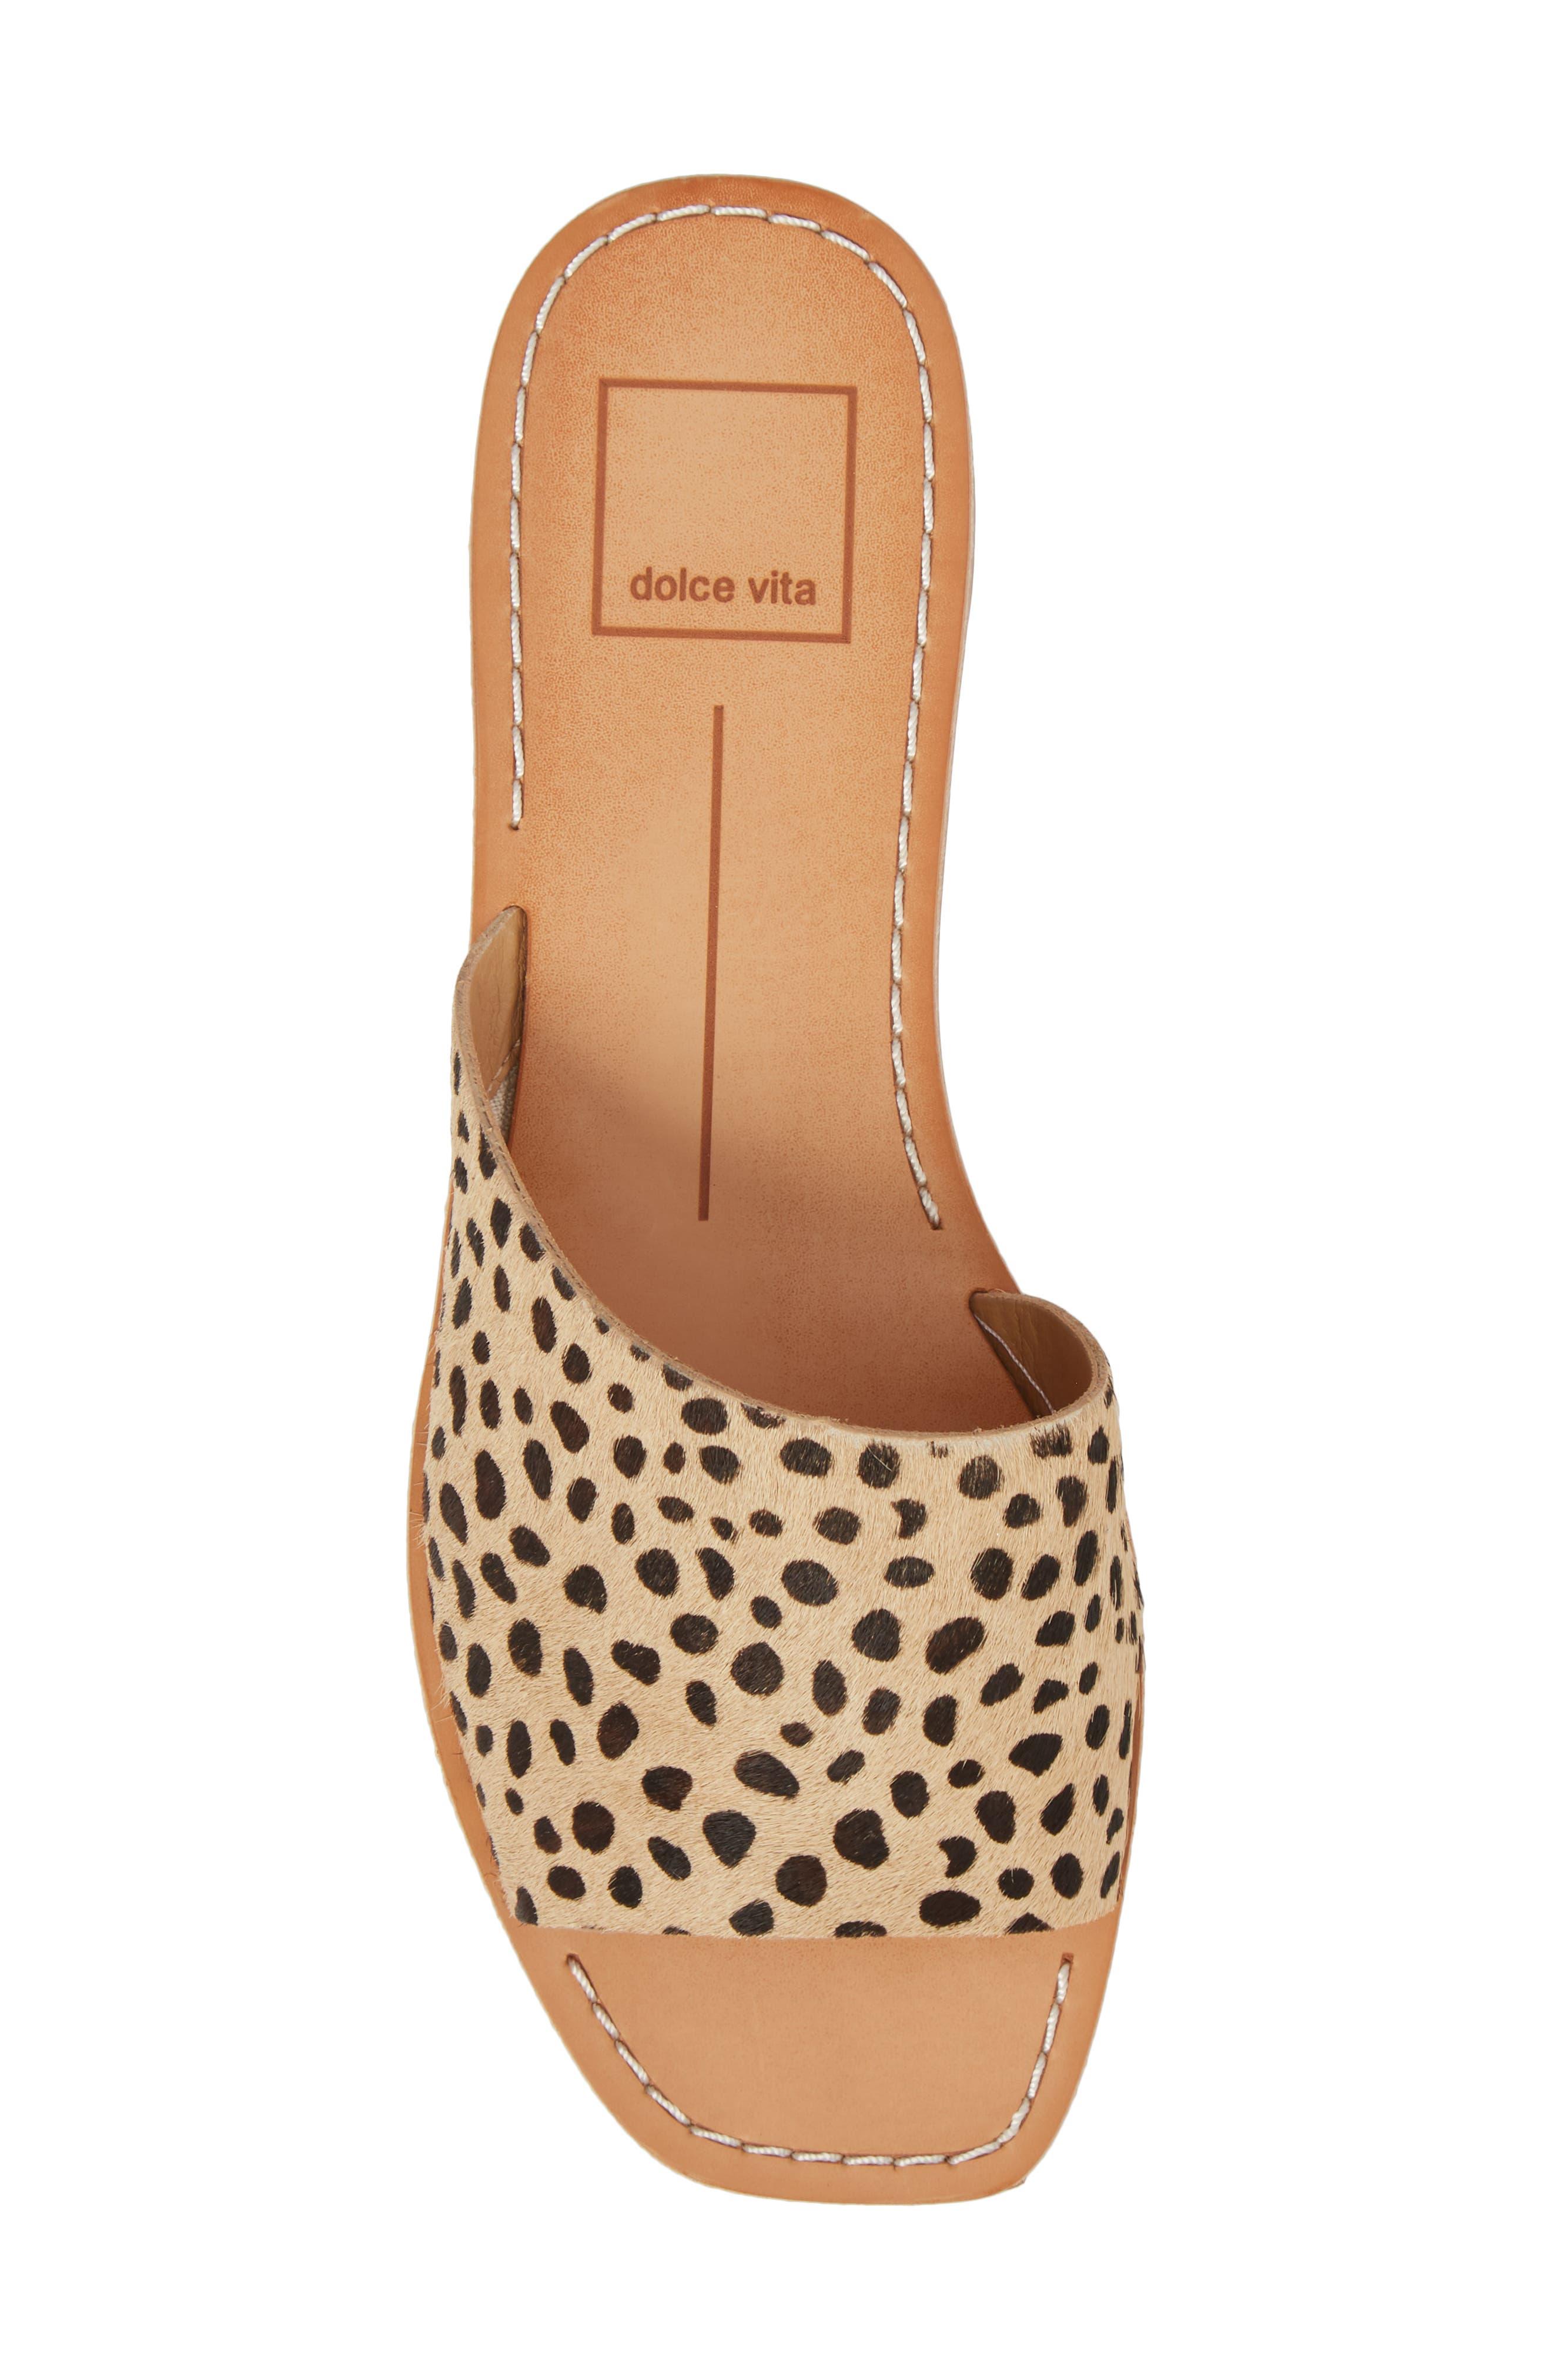 Cato Genuine Calf Hair Slide Sandal,                             Alternate thumbnail 5, color,                             Leopard Calf Hair